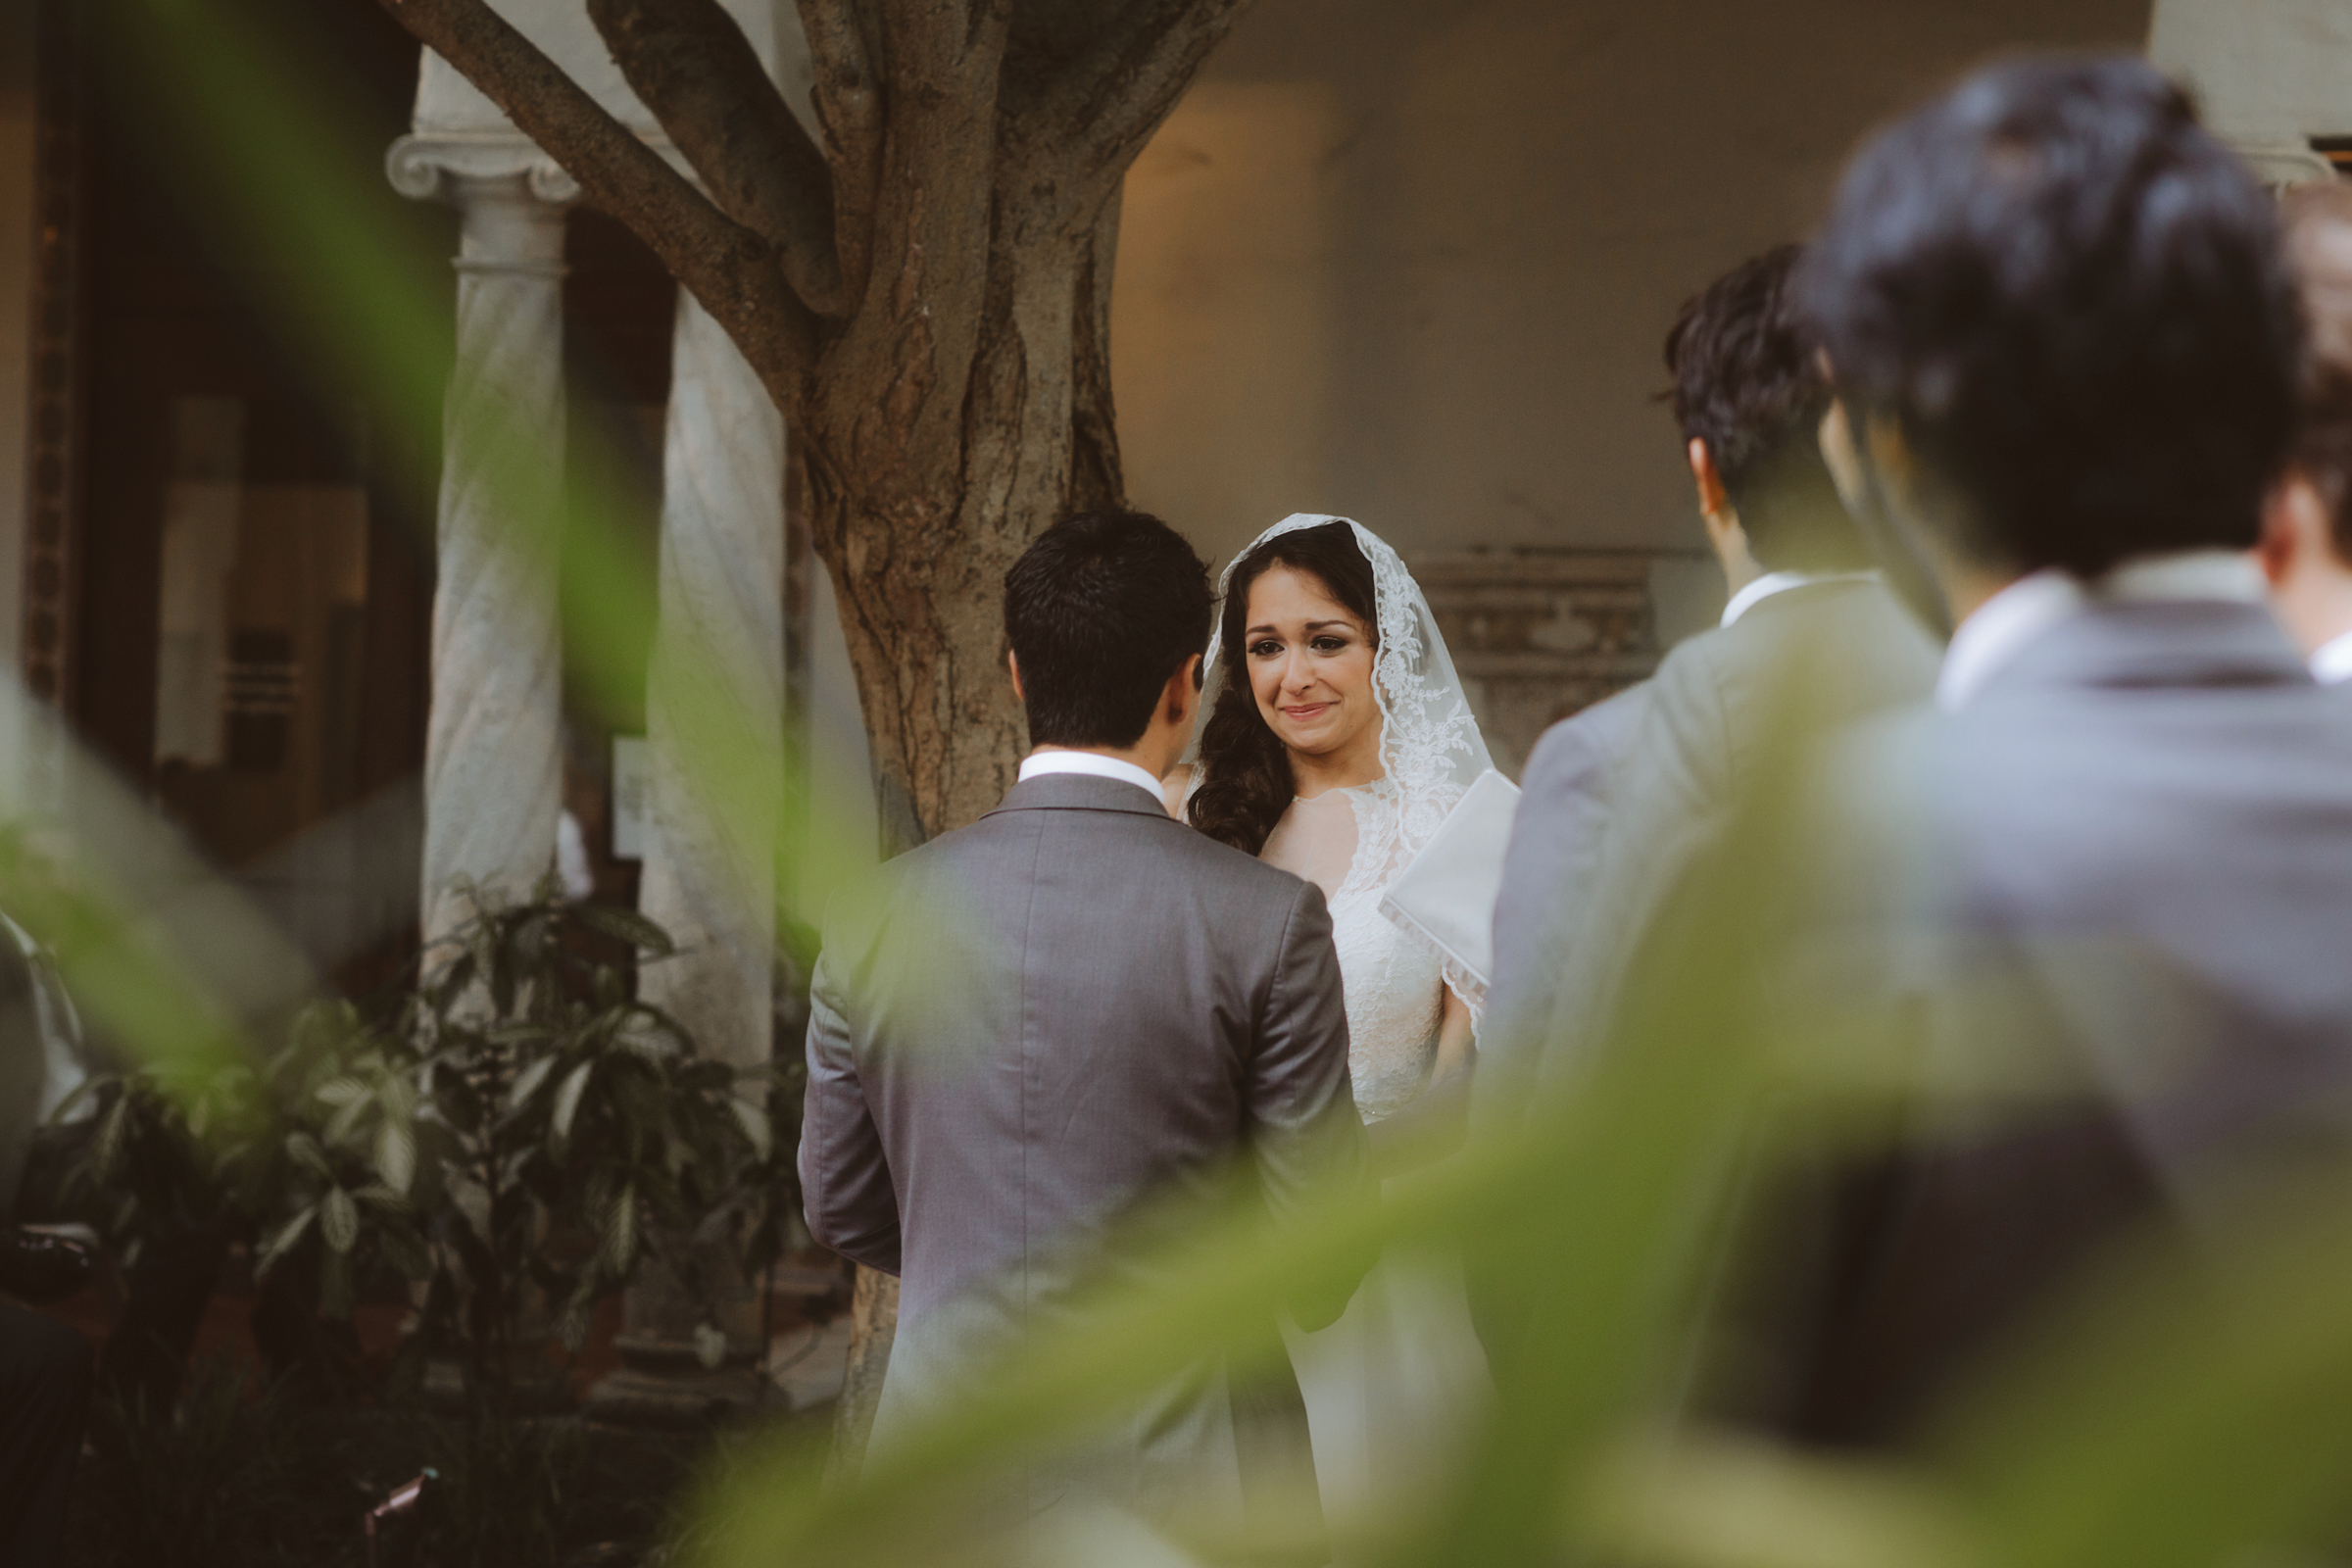 wedding day | MFA St Pete | Vanessa Boy Photography | vanessaboy.com-354.com |final.jpg